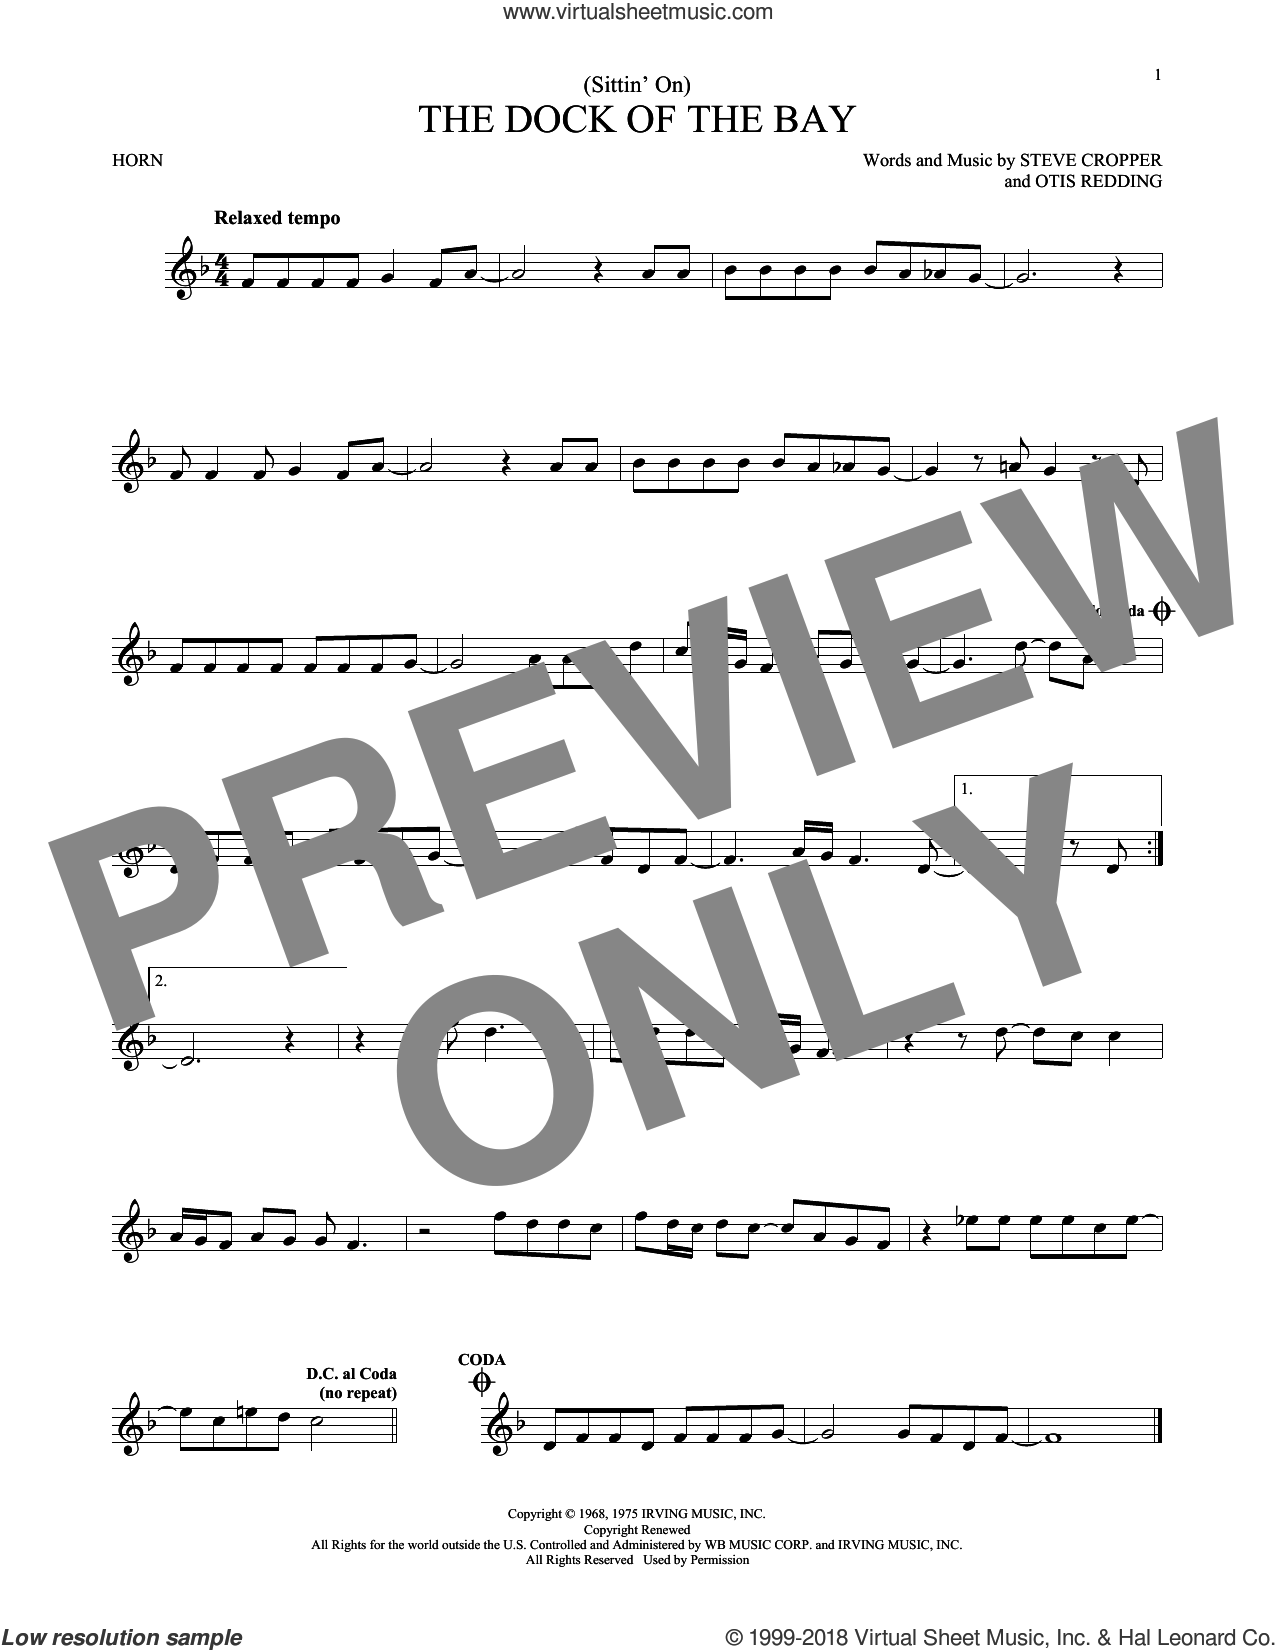 (Sittin' On) The Dock Of The Bay sheet music for horn solo by Otis Redding and Steve Cropper, intermediate skill level